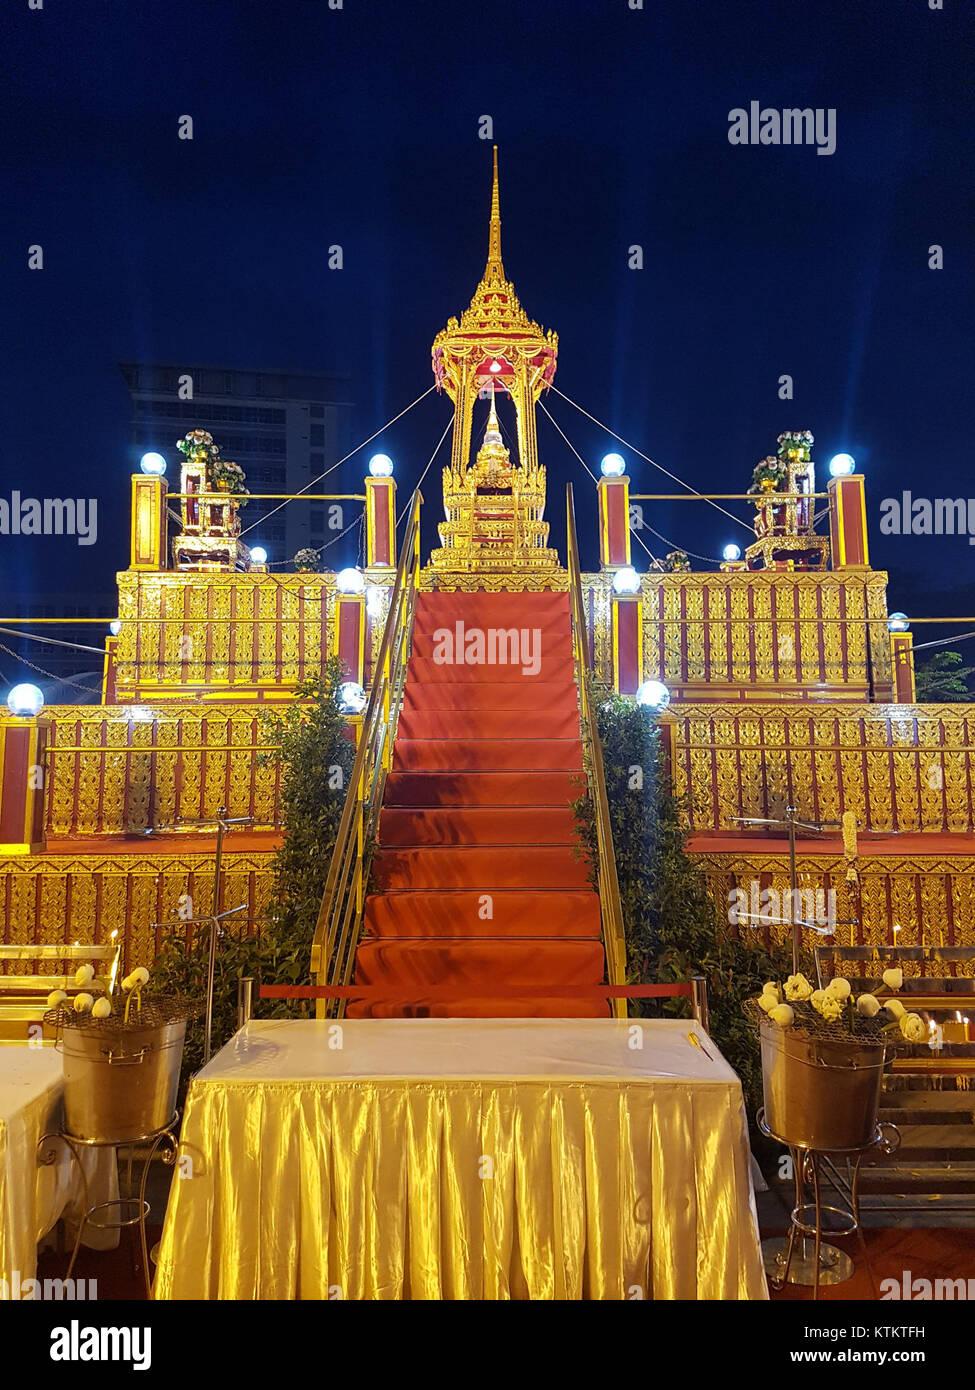 Bangkok Vesak   2017 05 07 (001) - Stock Image